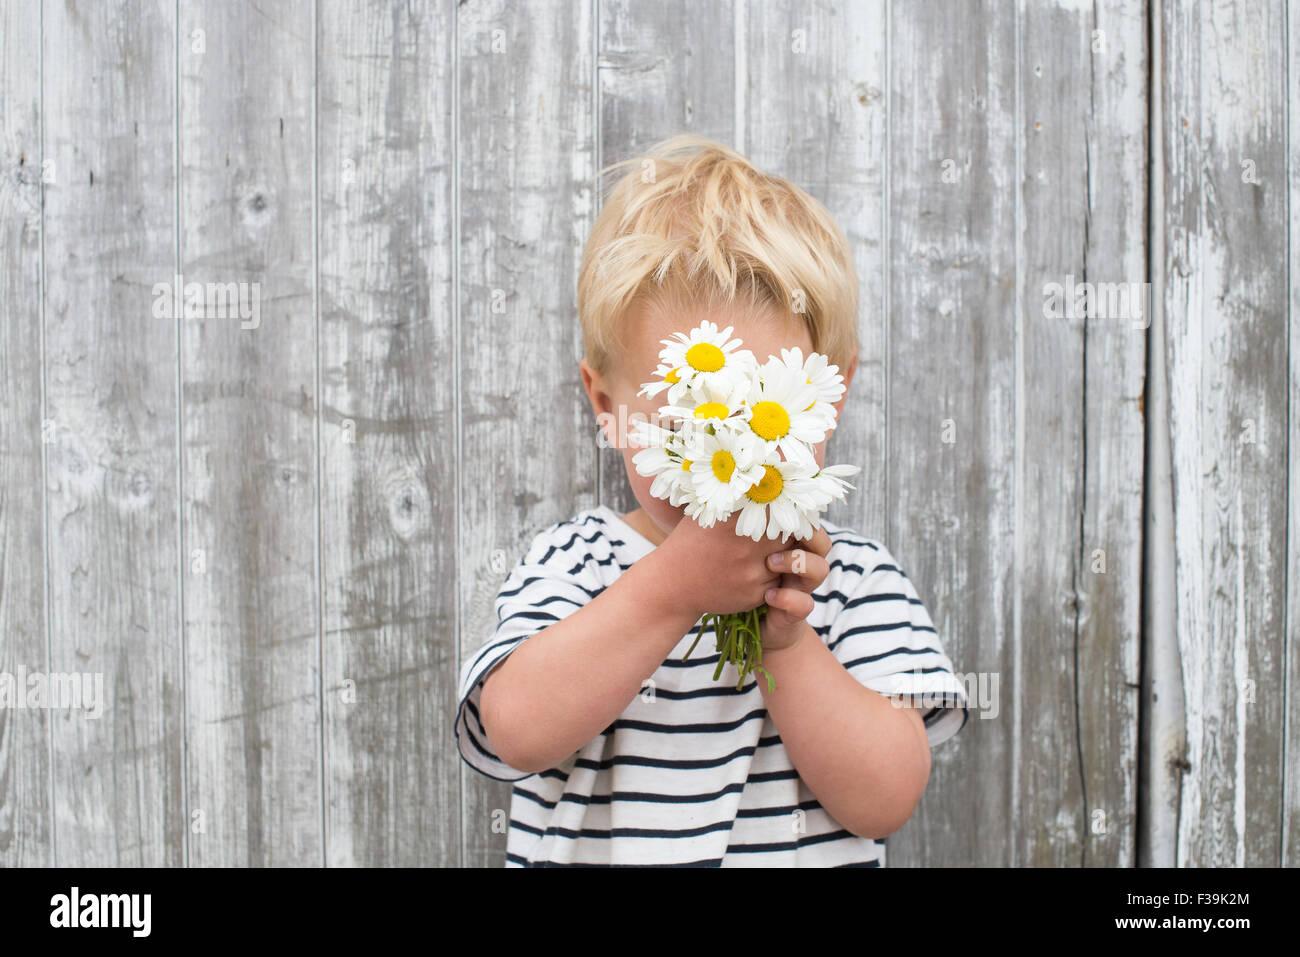 Boy hiding behind daisies - Stock Image